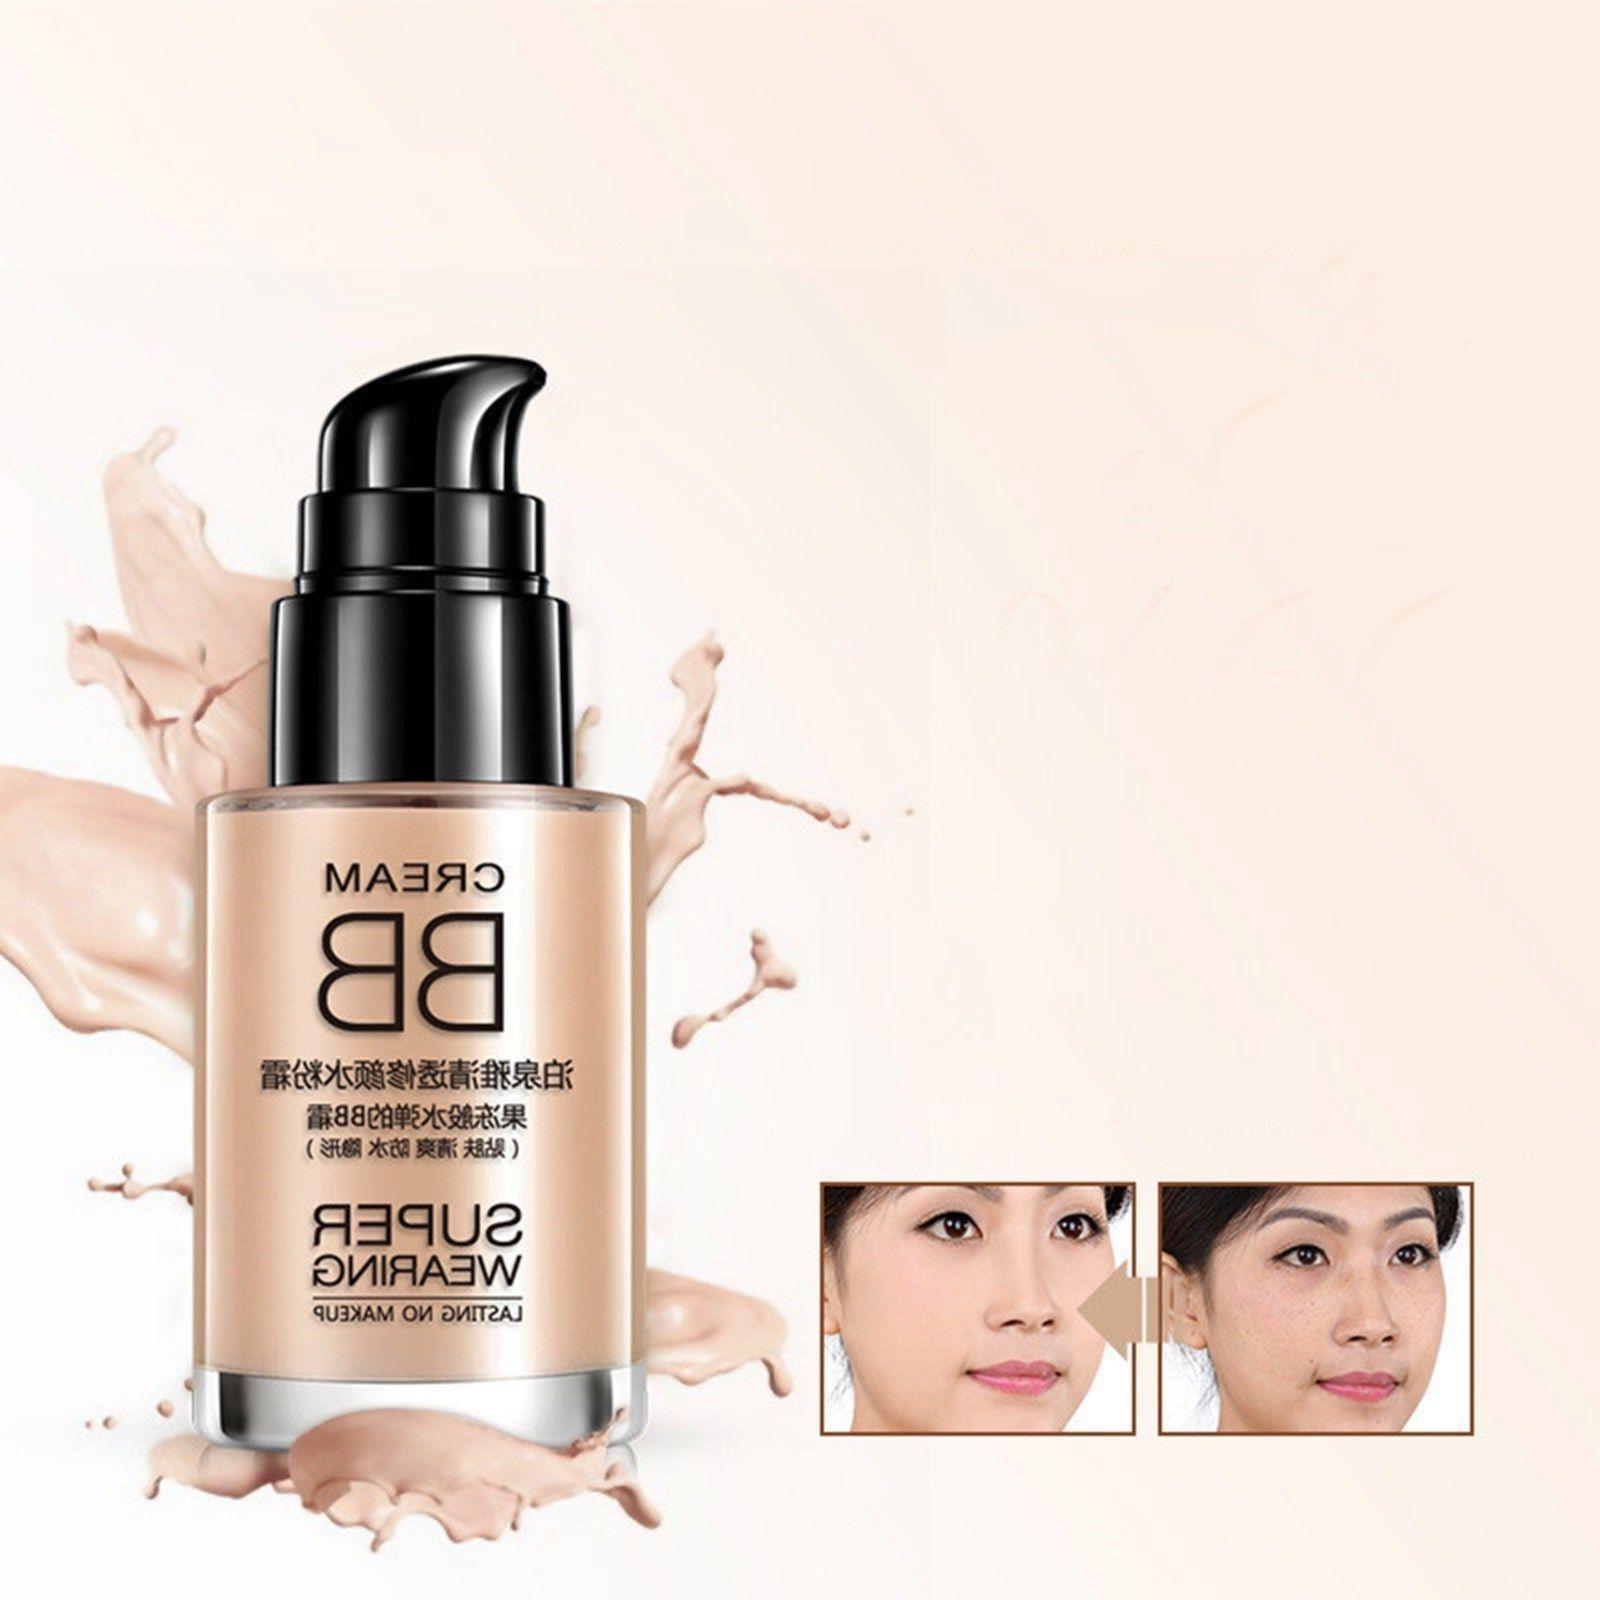 BIOAQU BB Whitening Moisturize Makeup